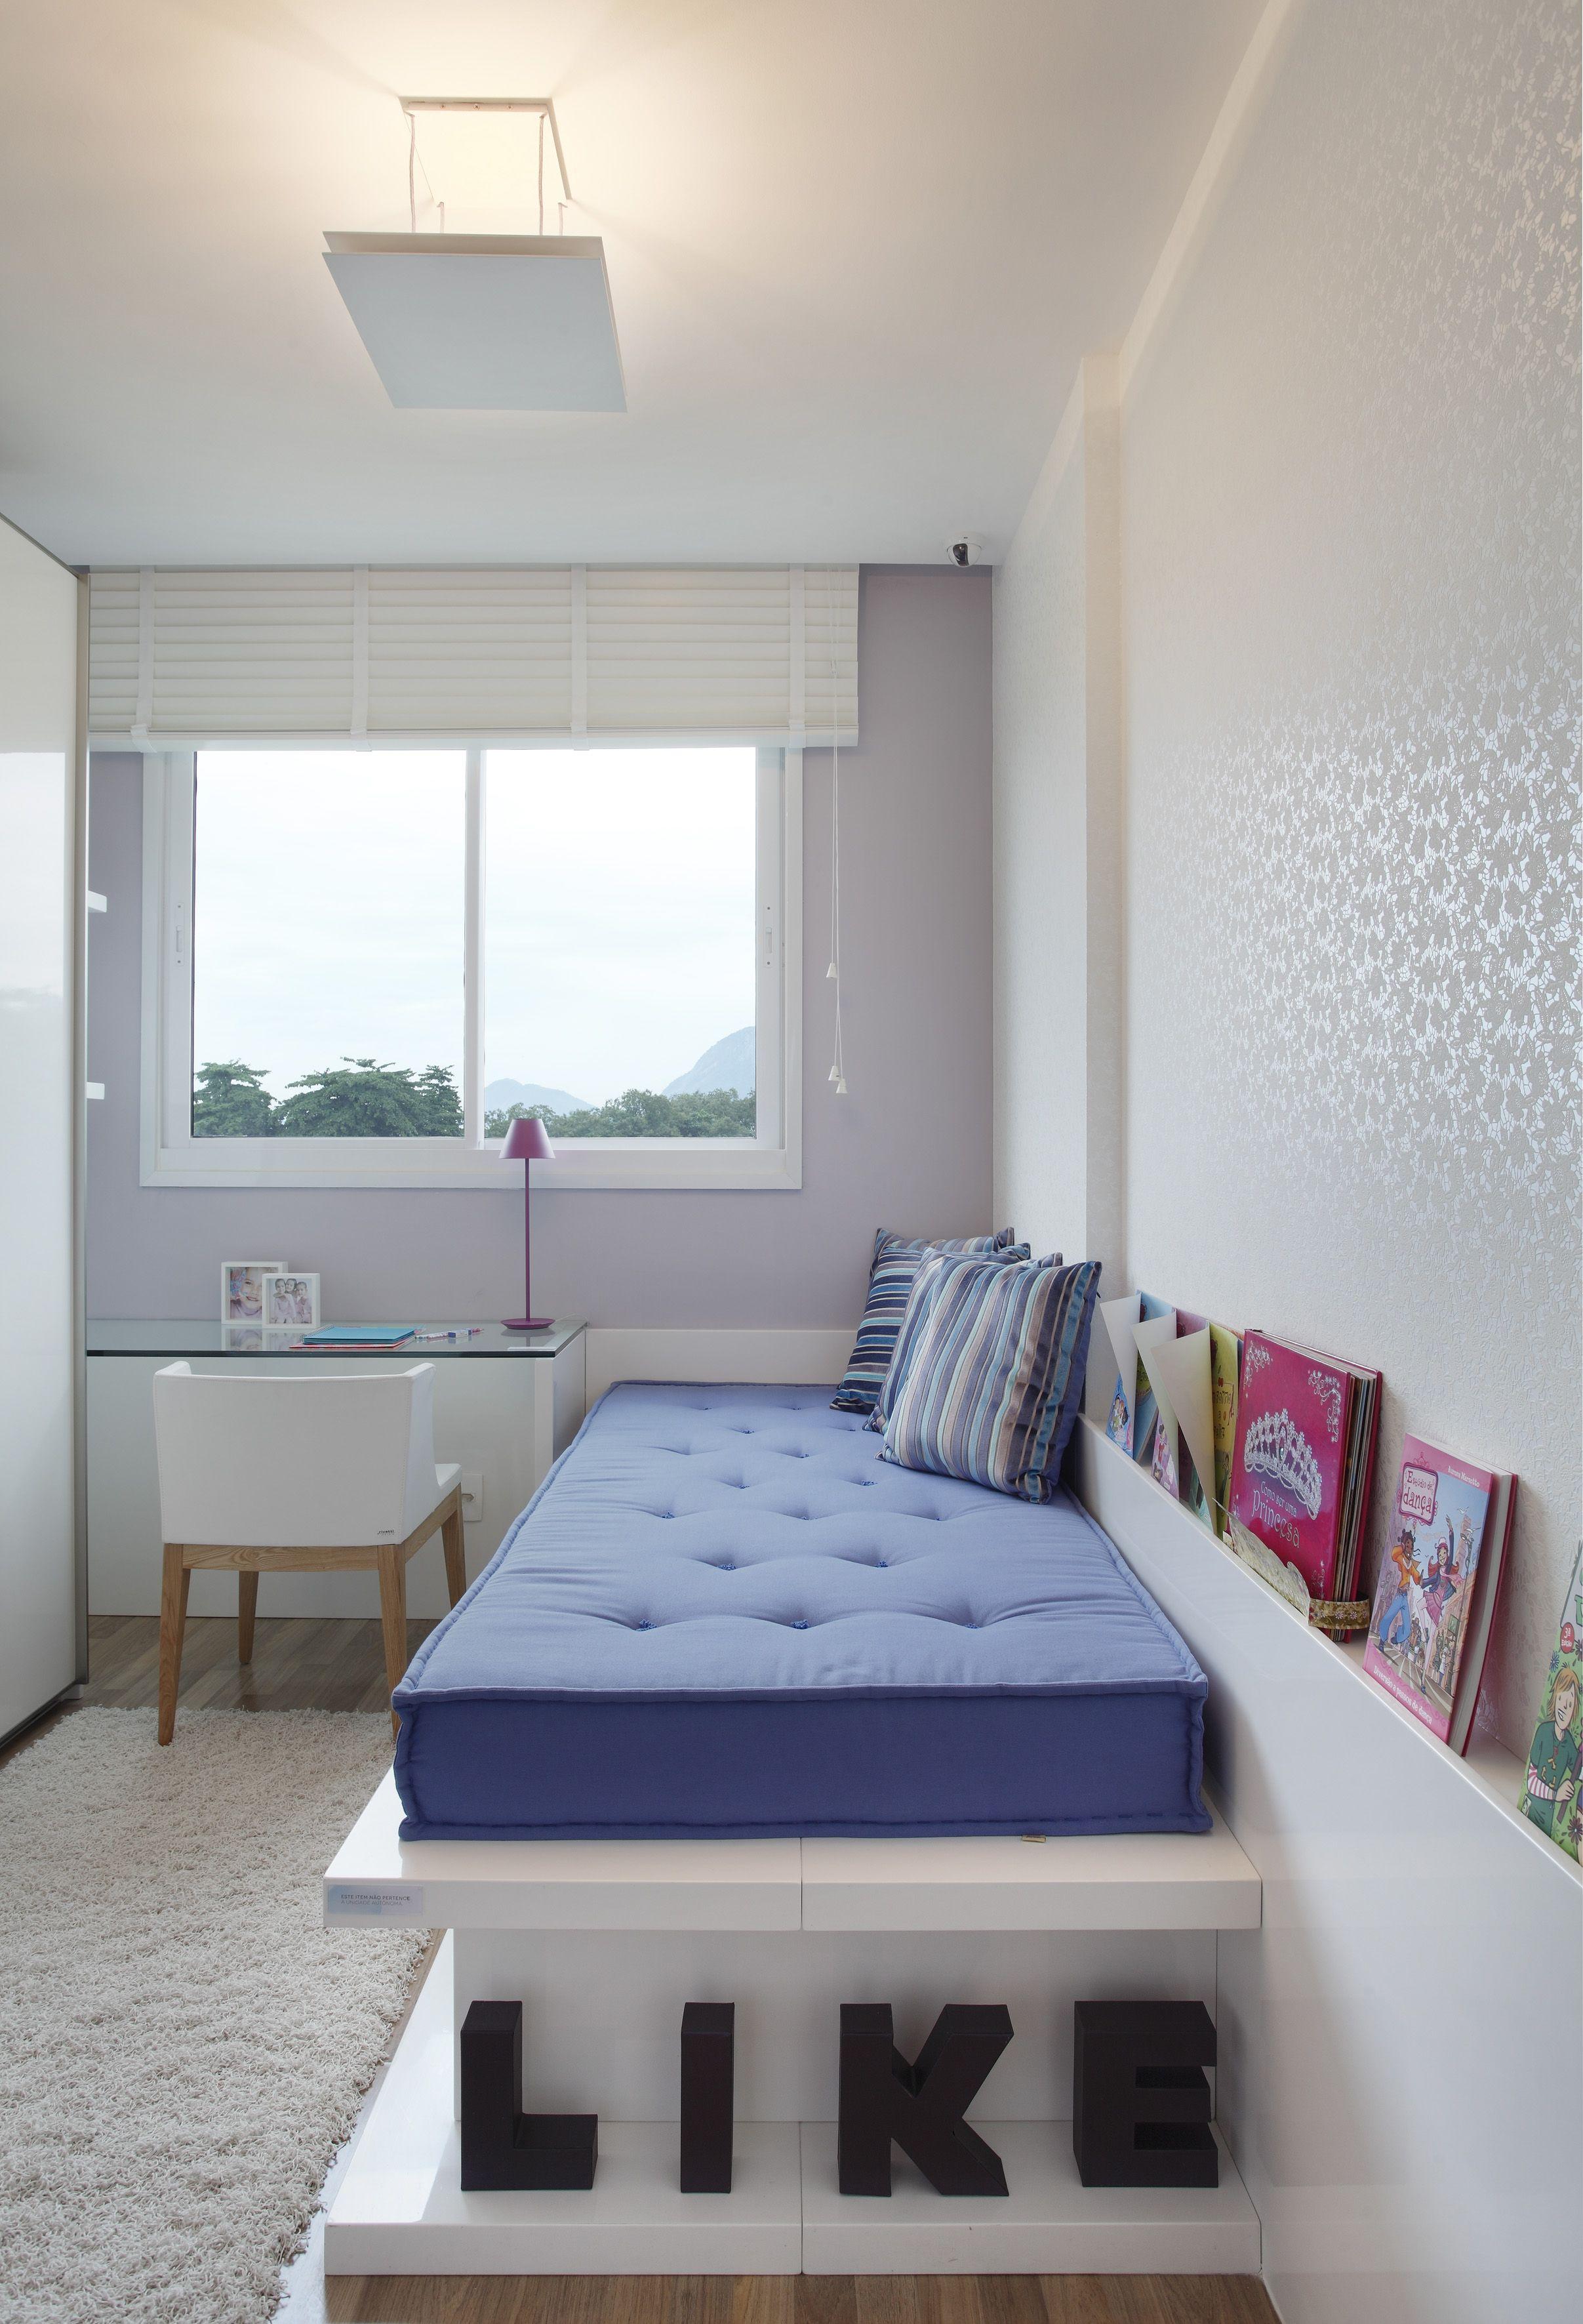 Apartamento Decorado Odebrecht 2 Projeto Yamagata Arquitetura